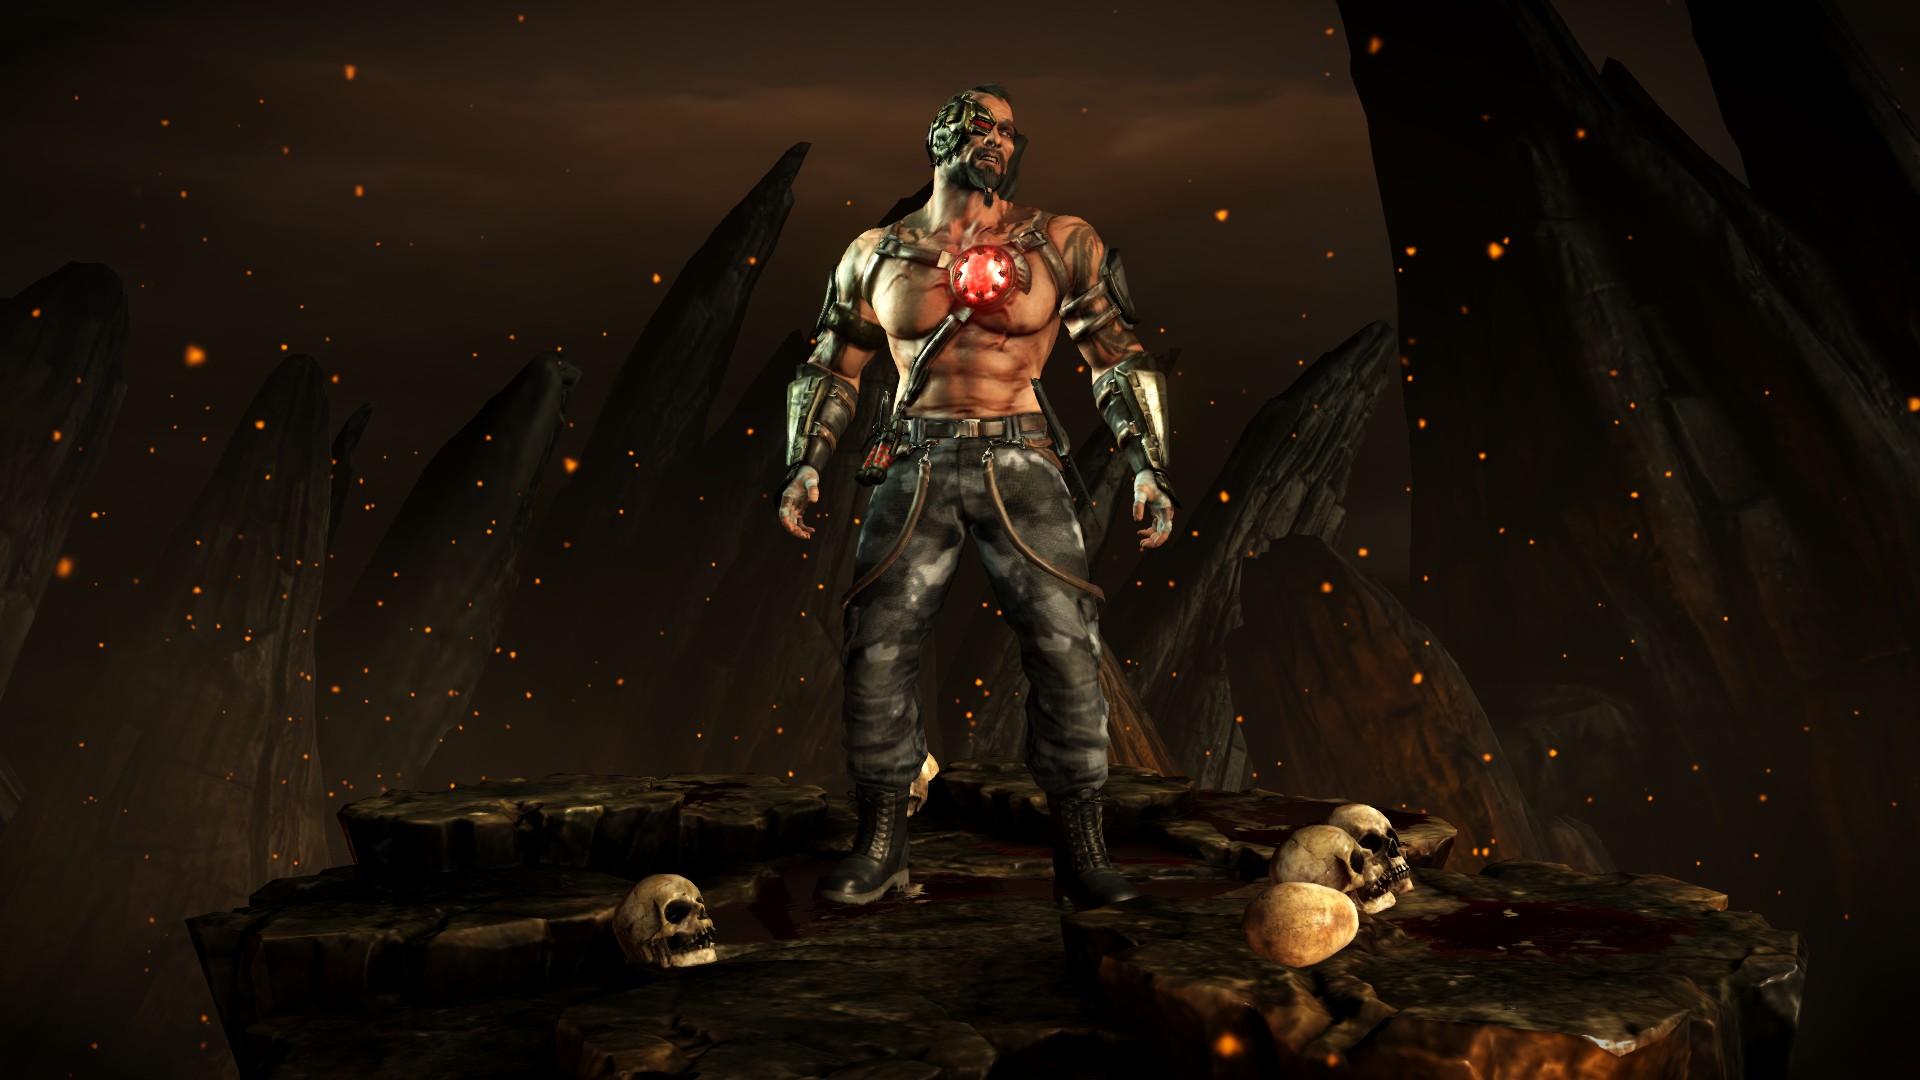 Кано (Стиль: Кибернетик) - Mortal Kombat X